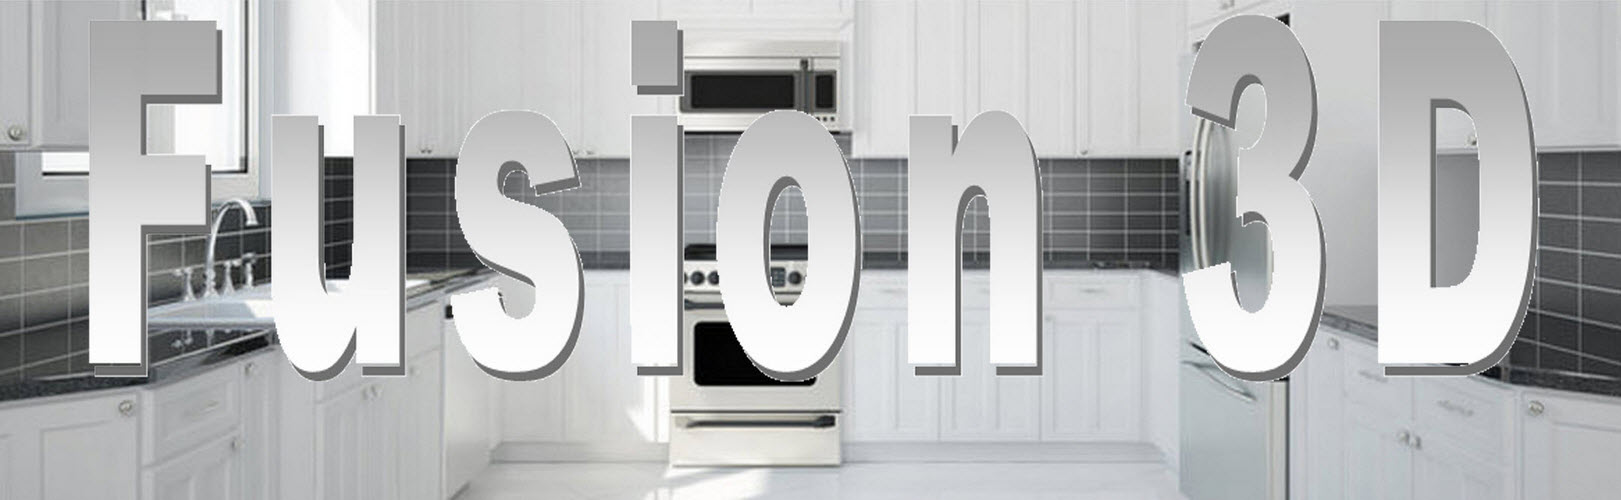 logiciel de cuisine fusion 3d sketchup. Black Bedroom Furniture Sets. Home Design Ideas